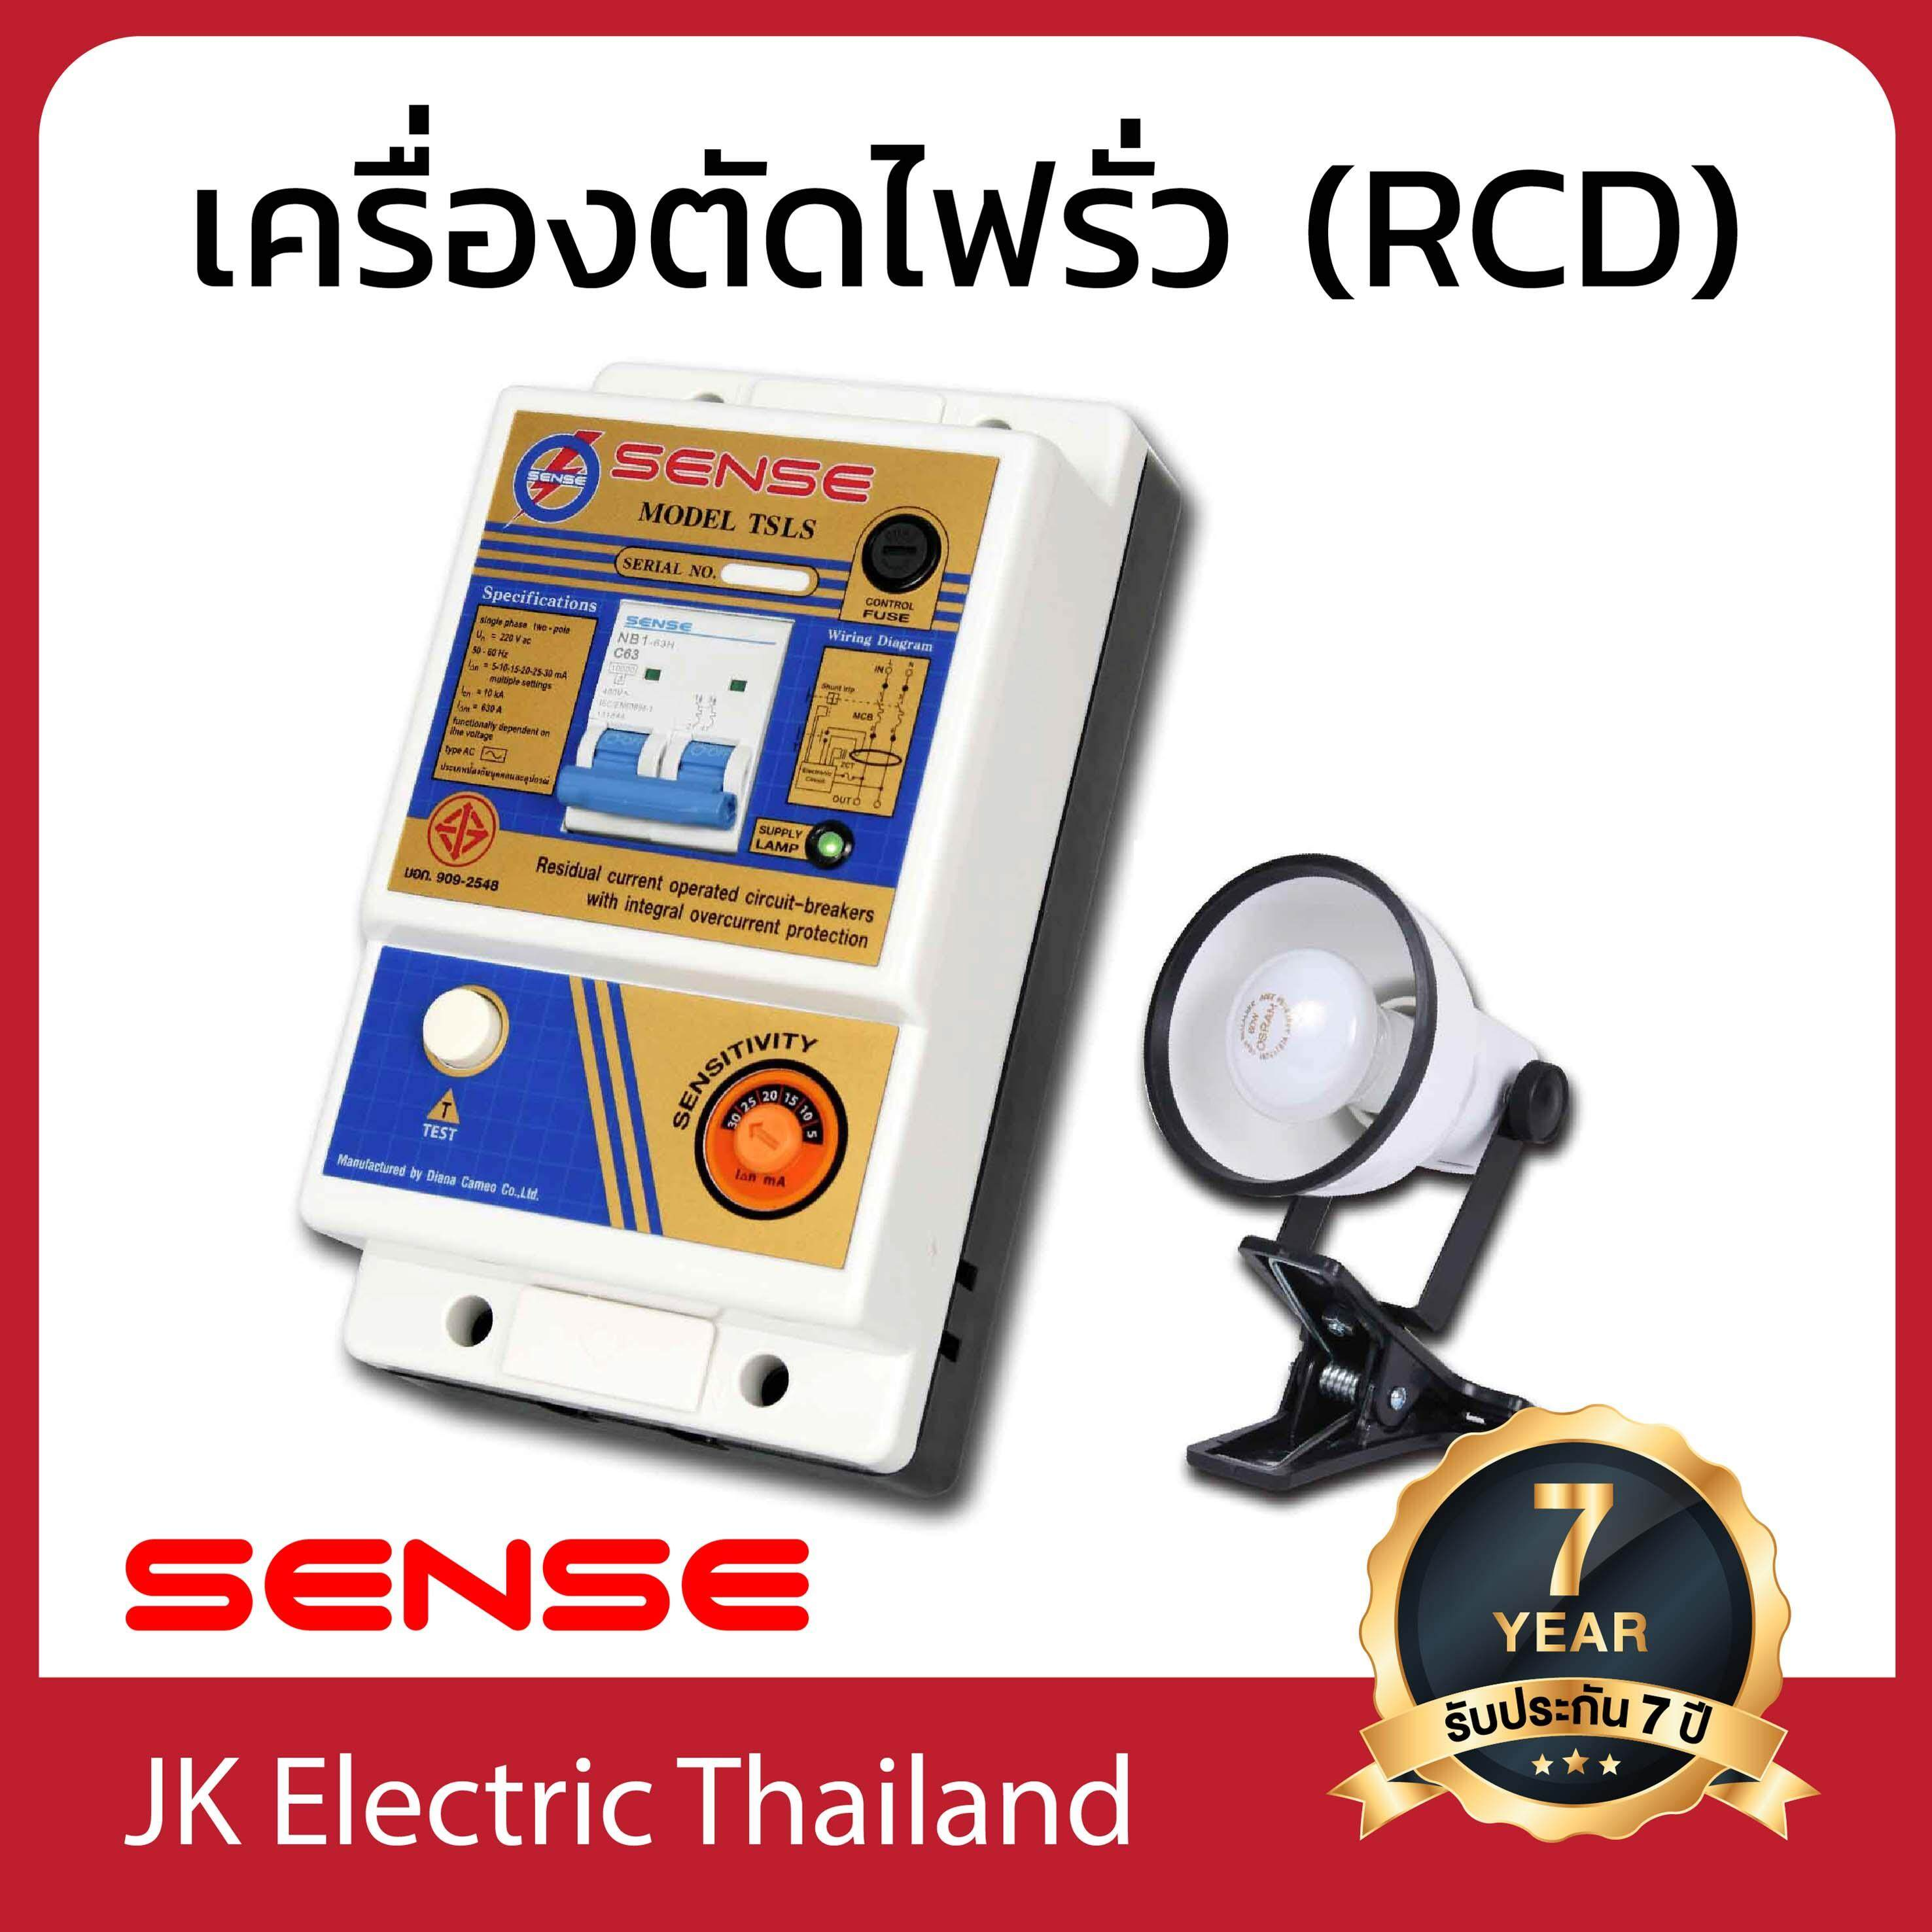 Sense กันดูด เครื่องตัดไฟ เครื่องตัดไฟรั่ว (rcd) พร้อมโคมไฟฉุกเฉิน เซนส์ รุ่น Tsls (ขนาดเมน 16a, 32a, 50a, 63a) ป้องกันไฟดูด ไฟช็อต ไฟรั่ว ใช้ไฟเกิน.